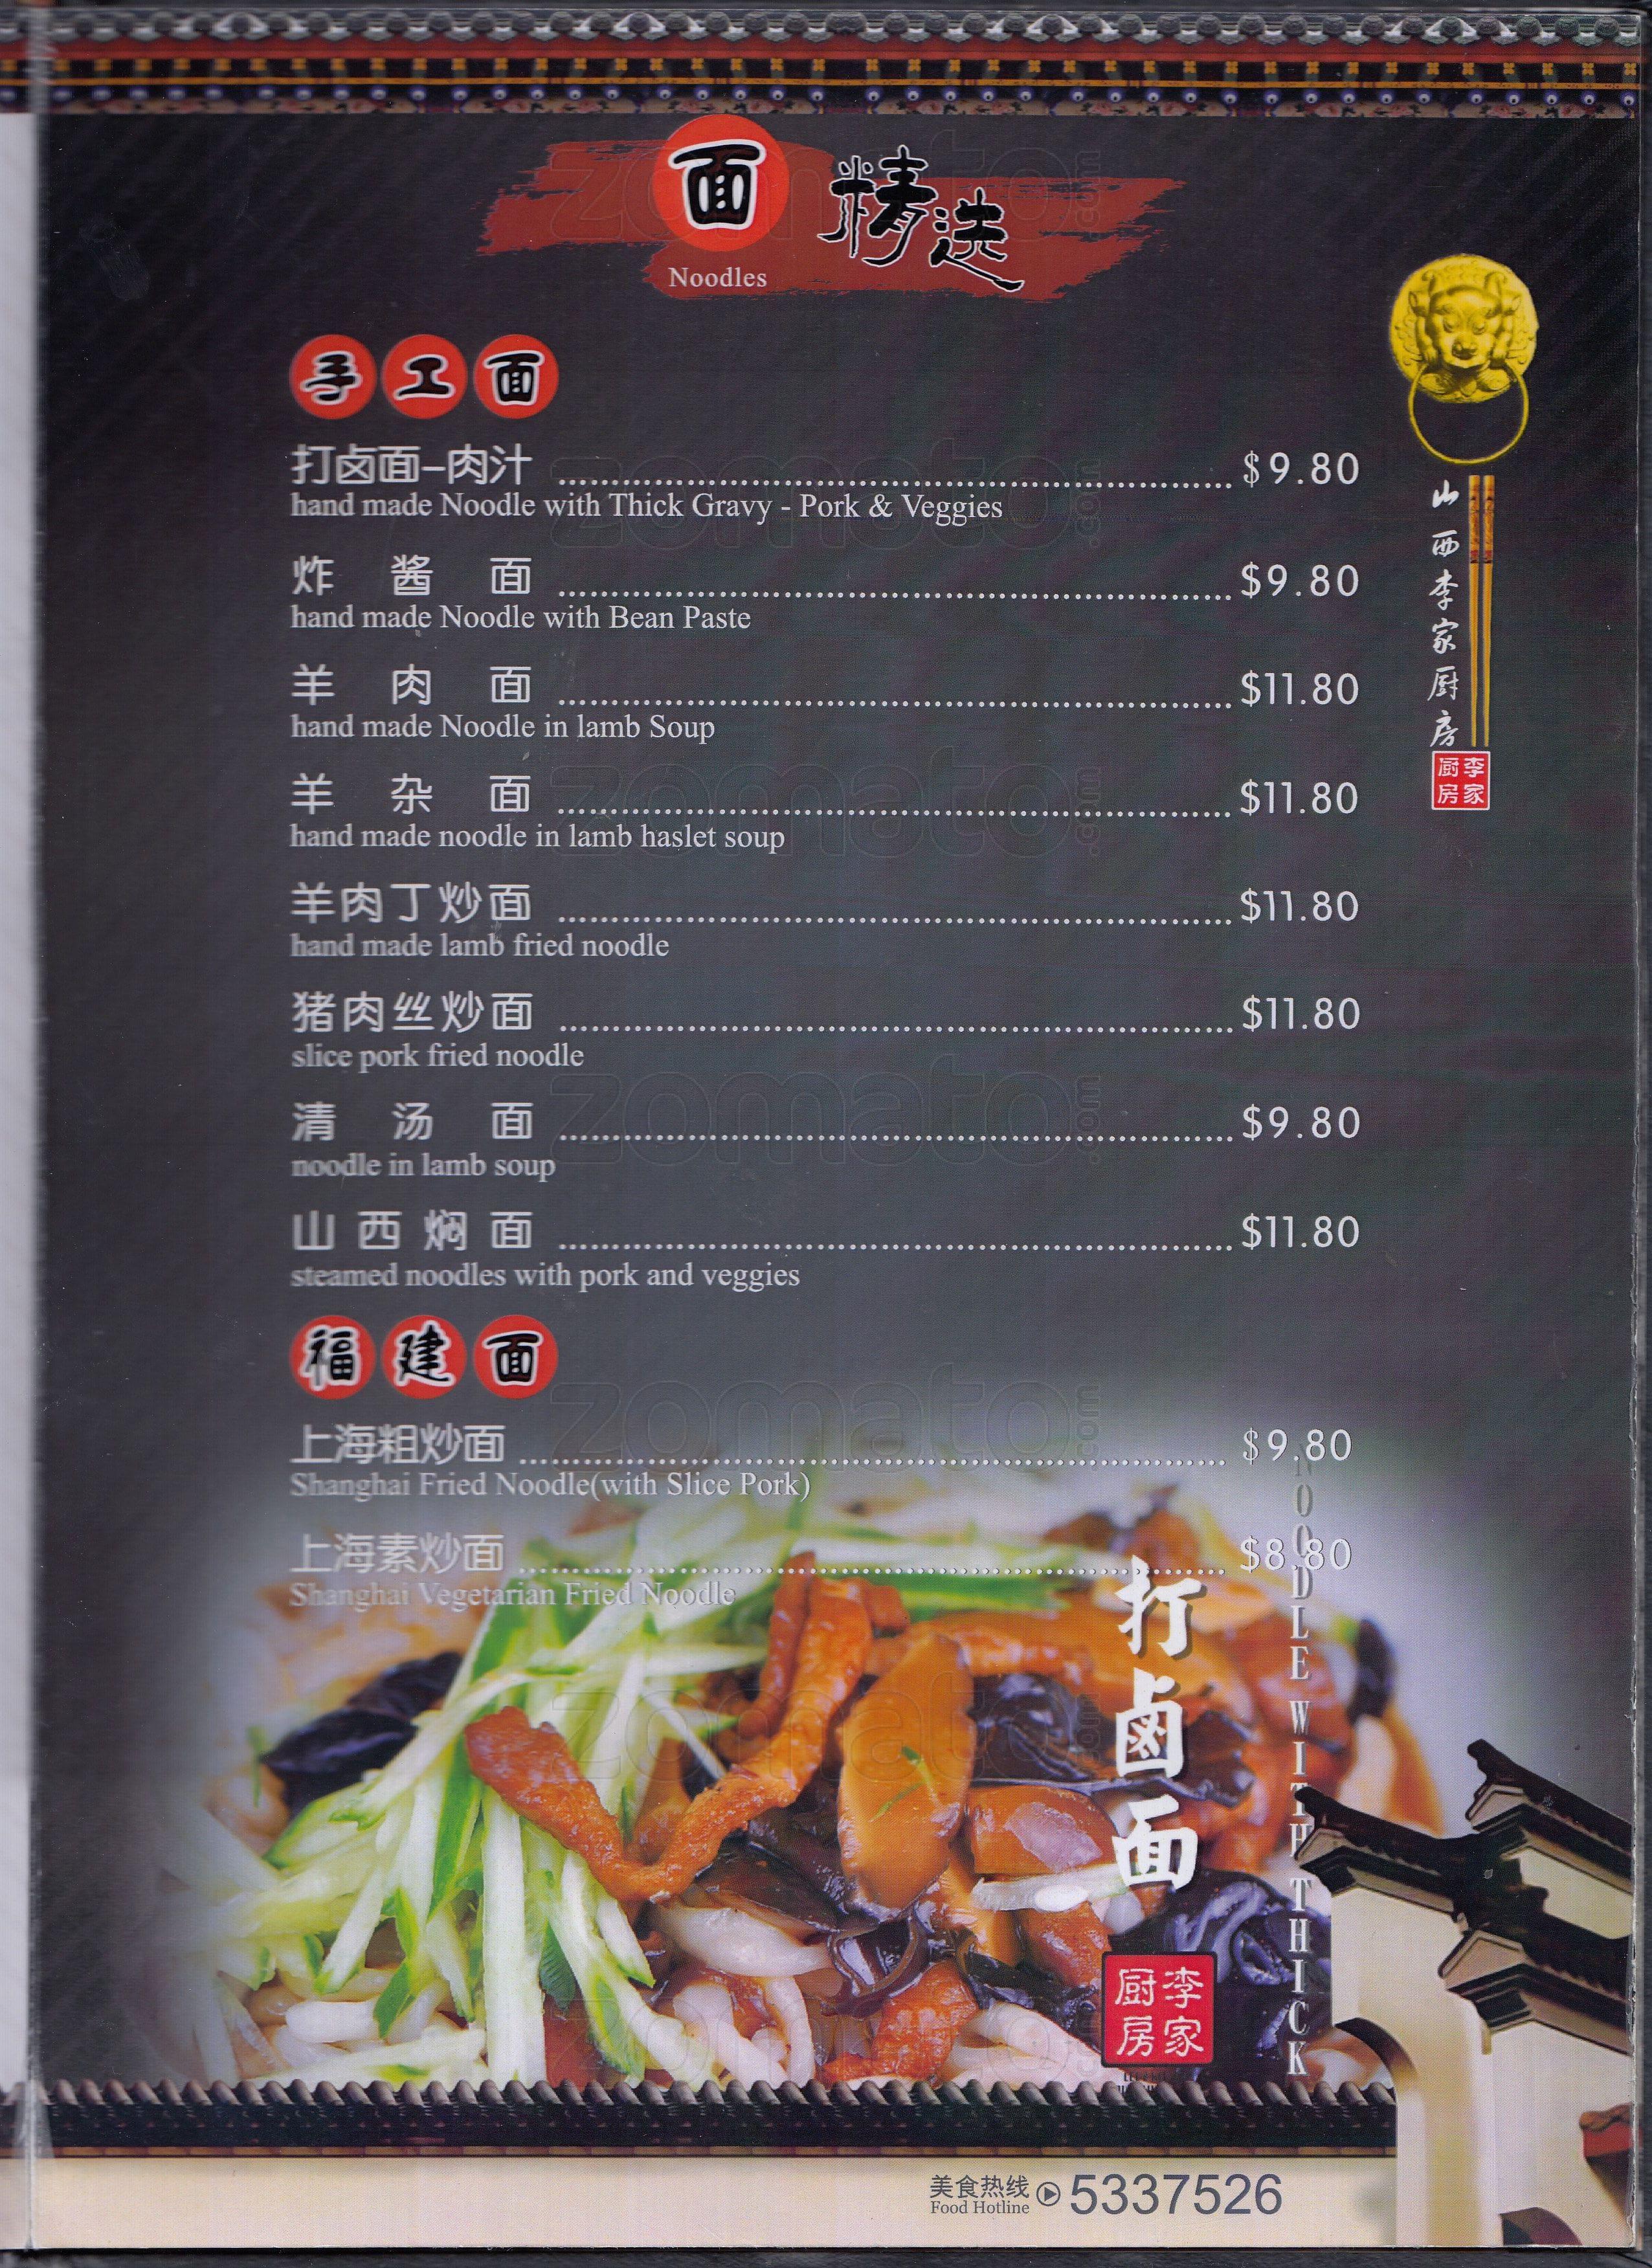 Menu at Lee's Kitchen, 160 Koornang Rd - Restaurant prices